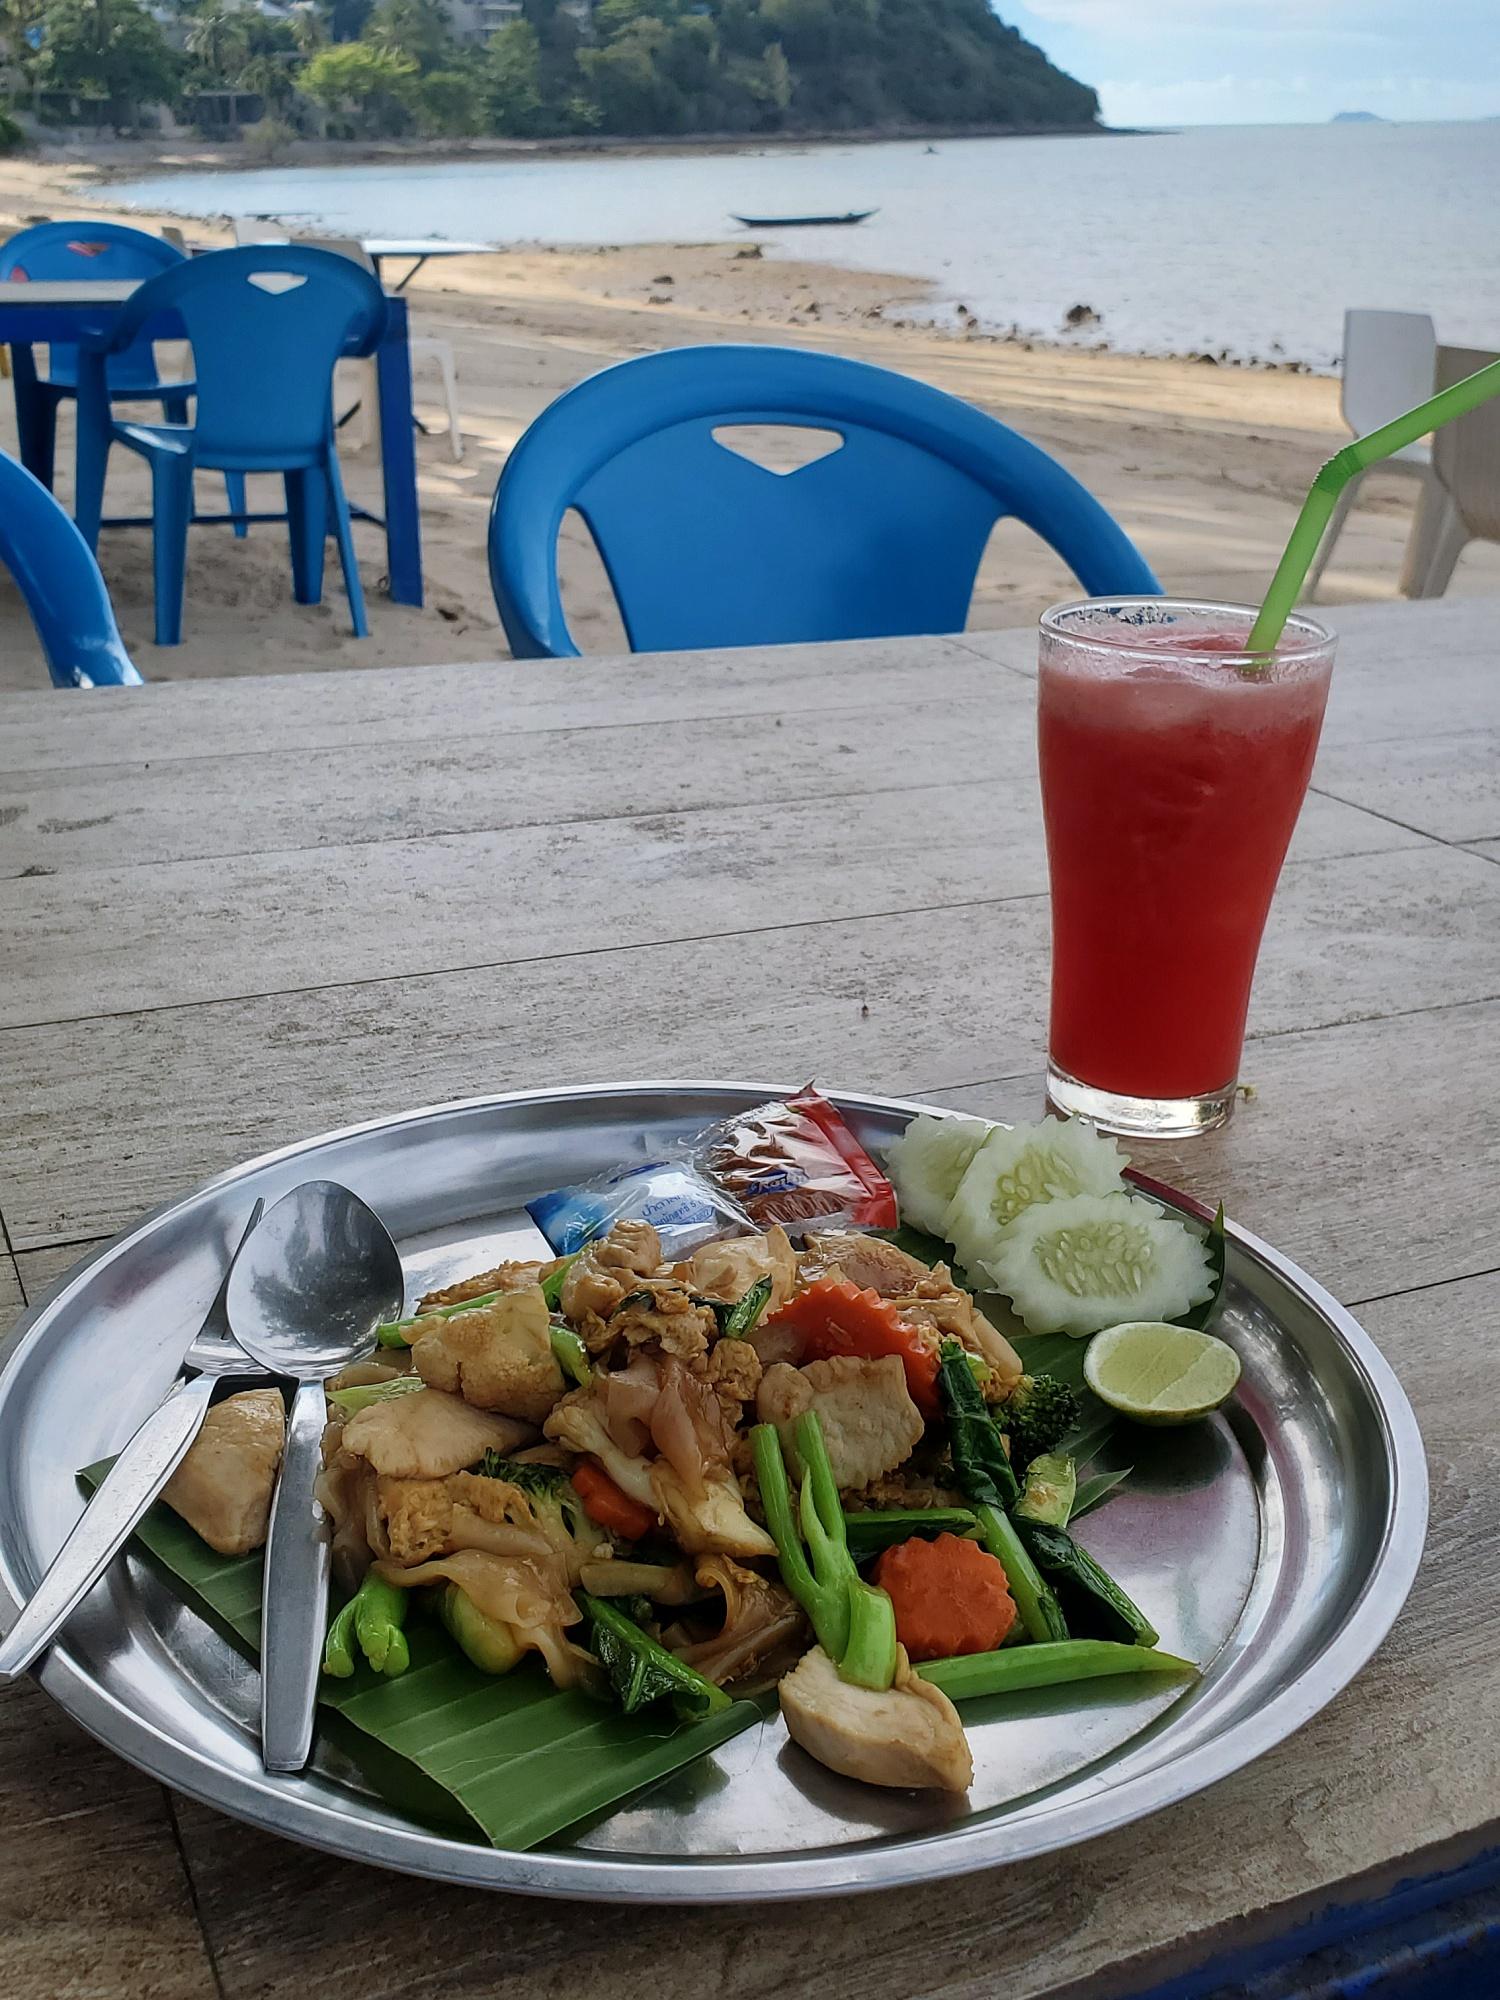 Chao Reau restaurant